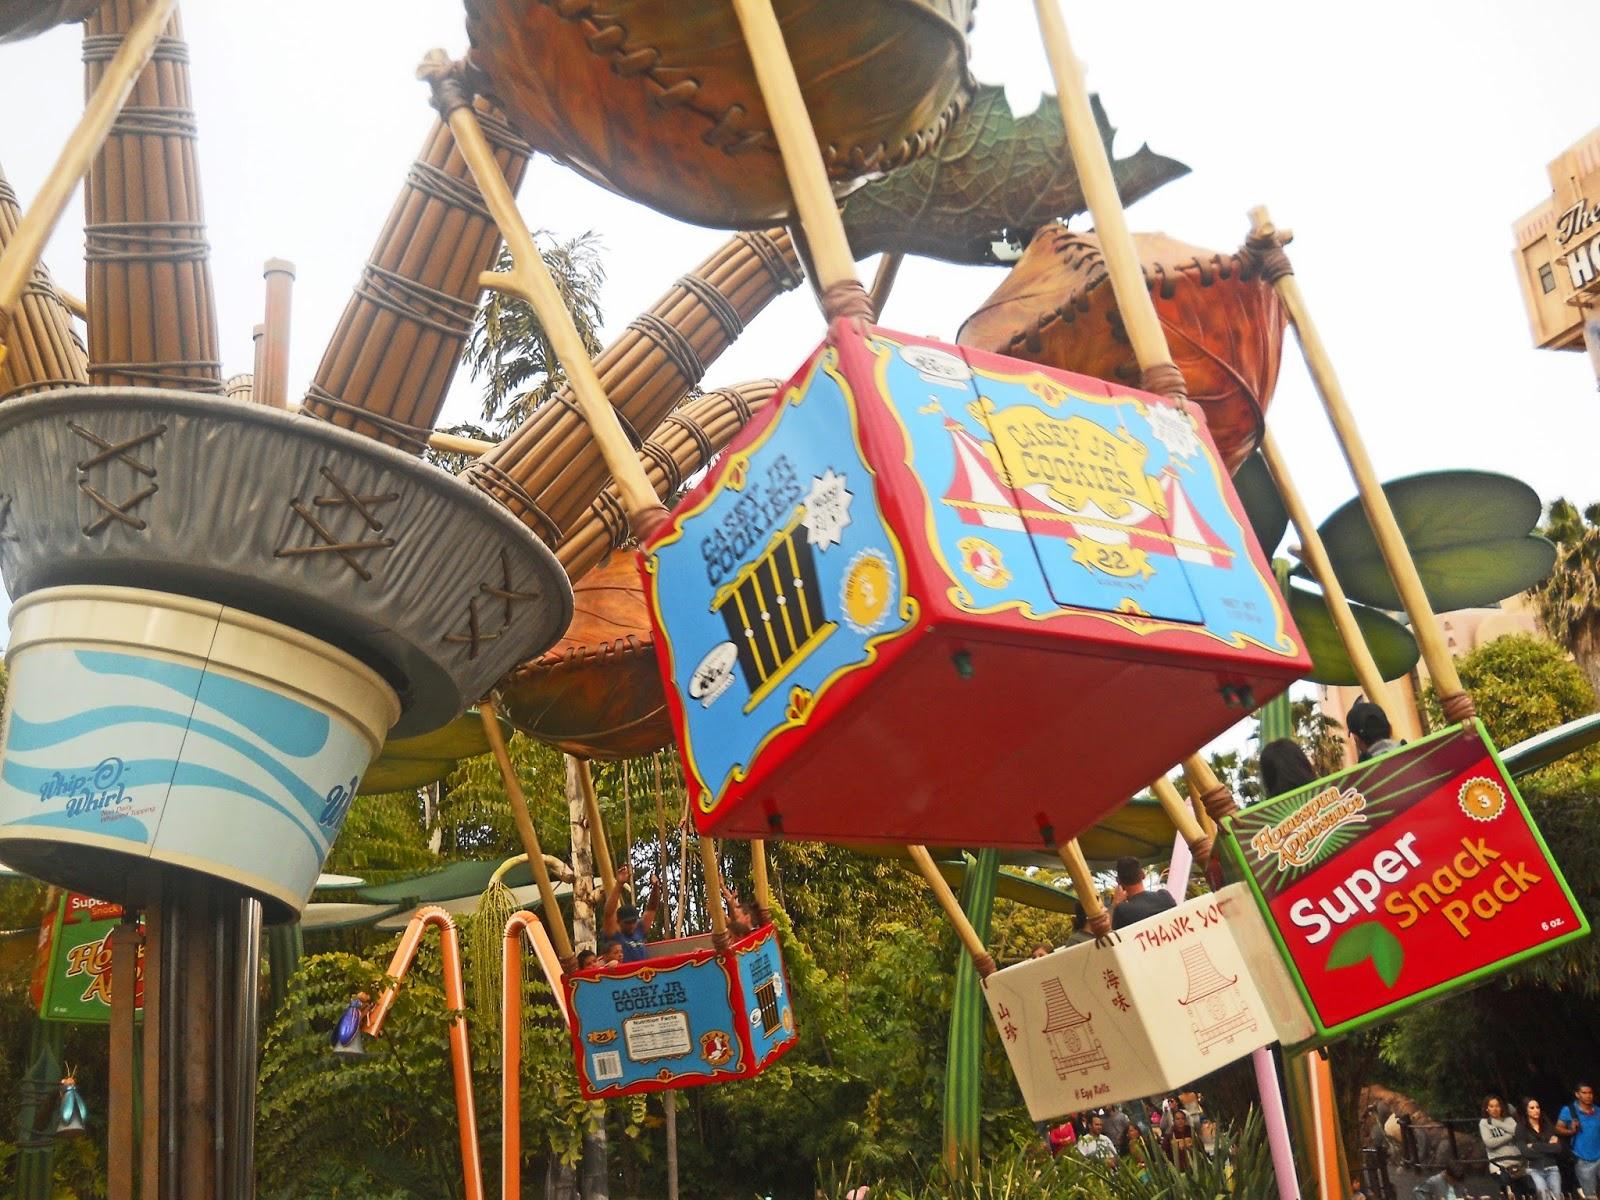 Best rides for preschoolers at Disneyland from LoveOurDisney.com